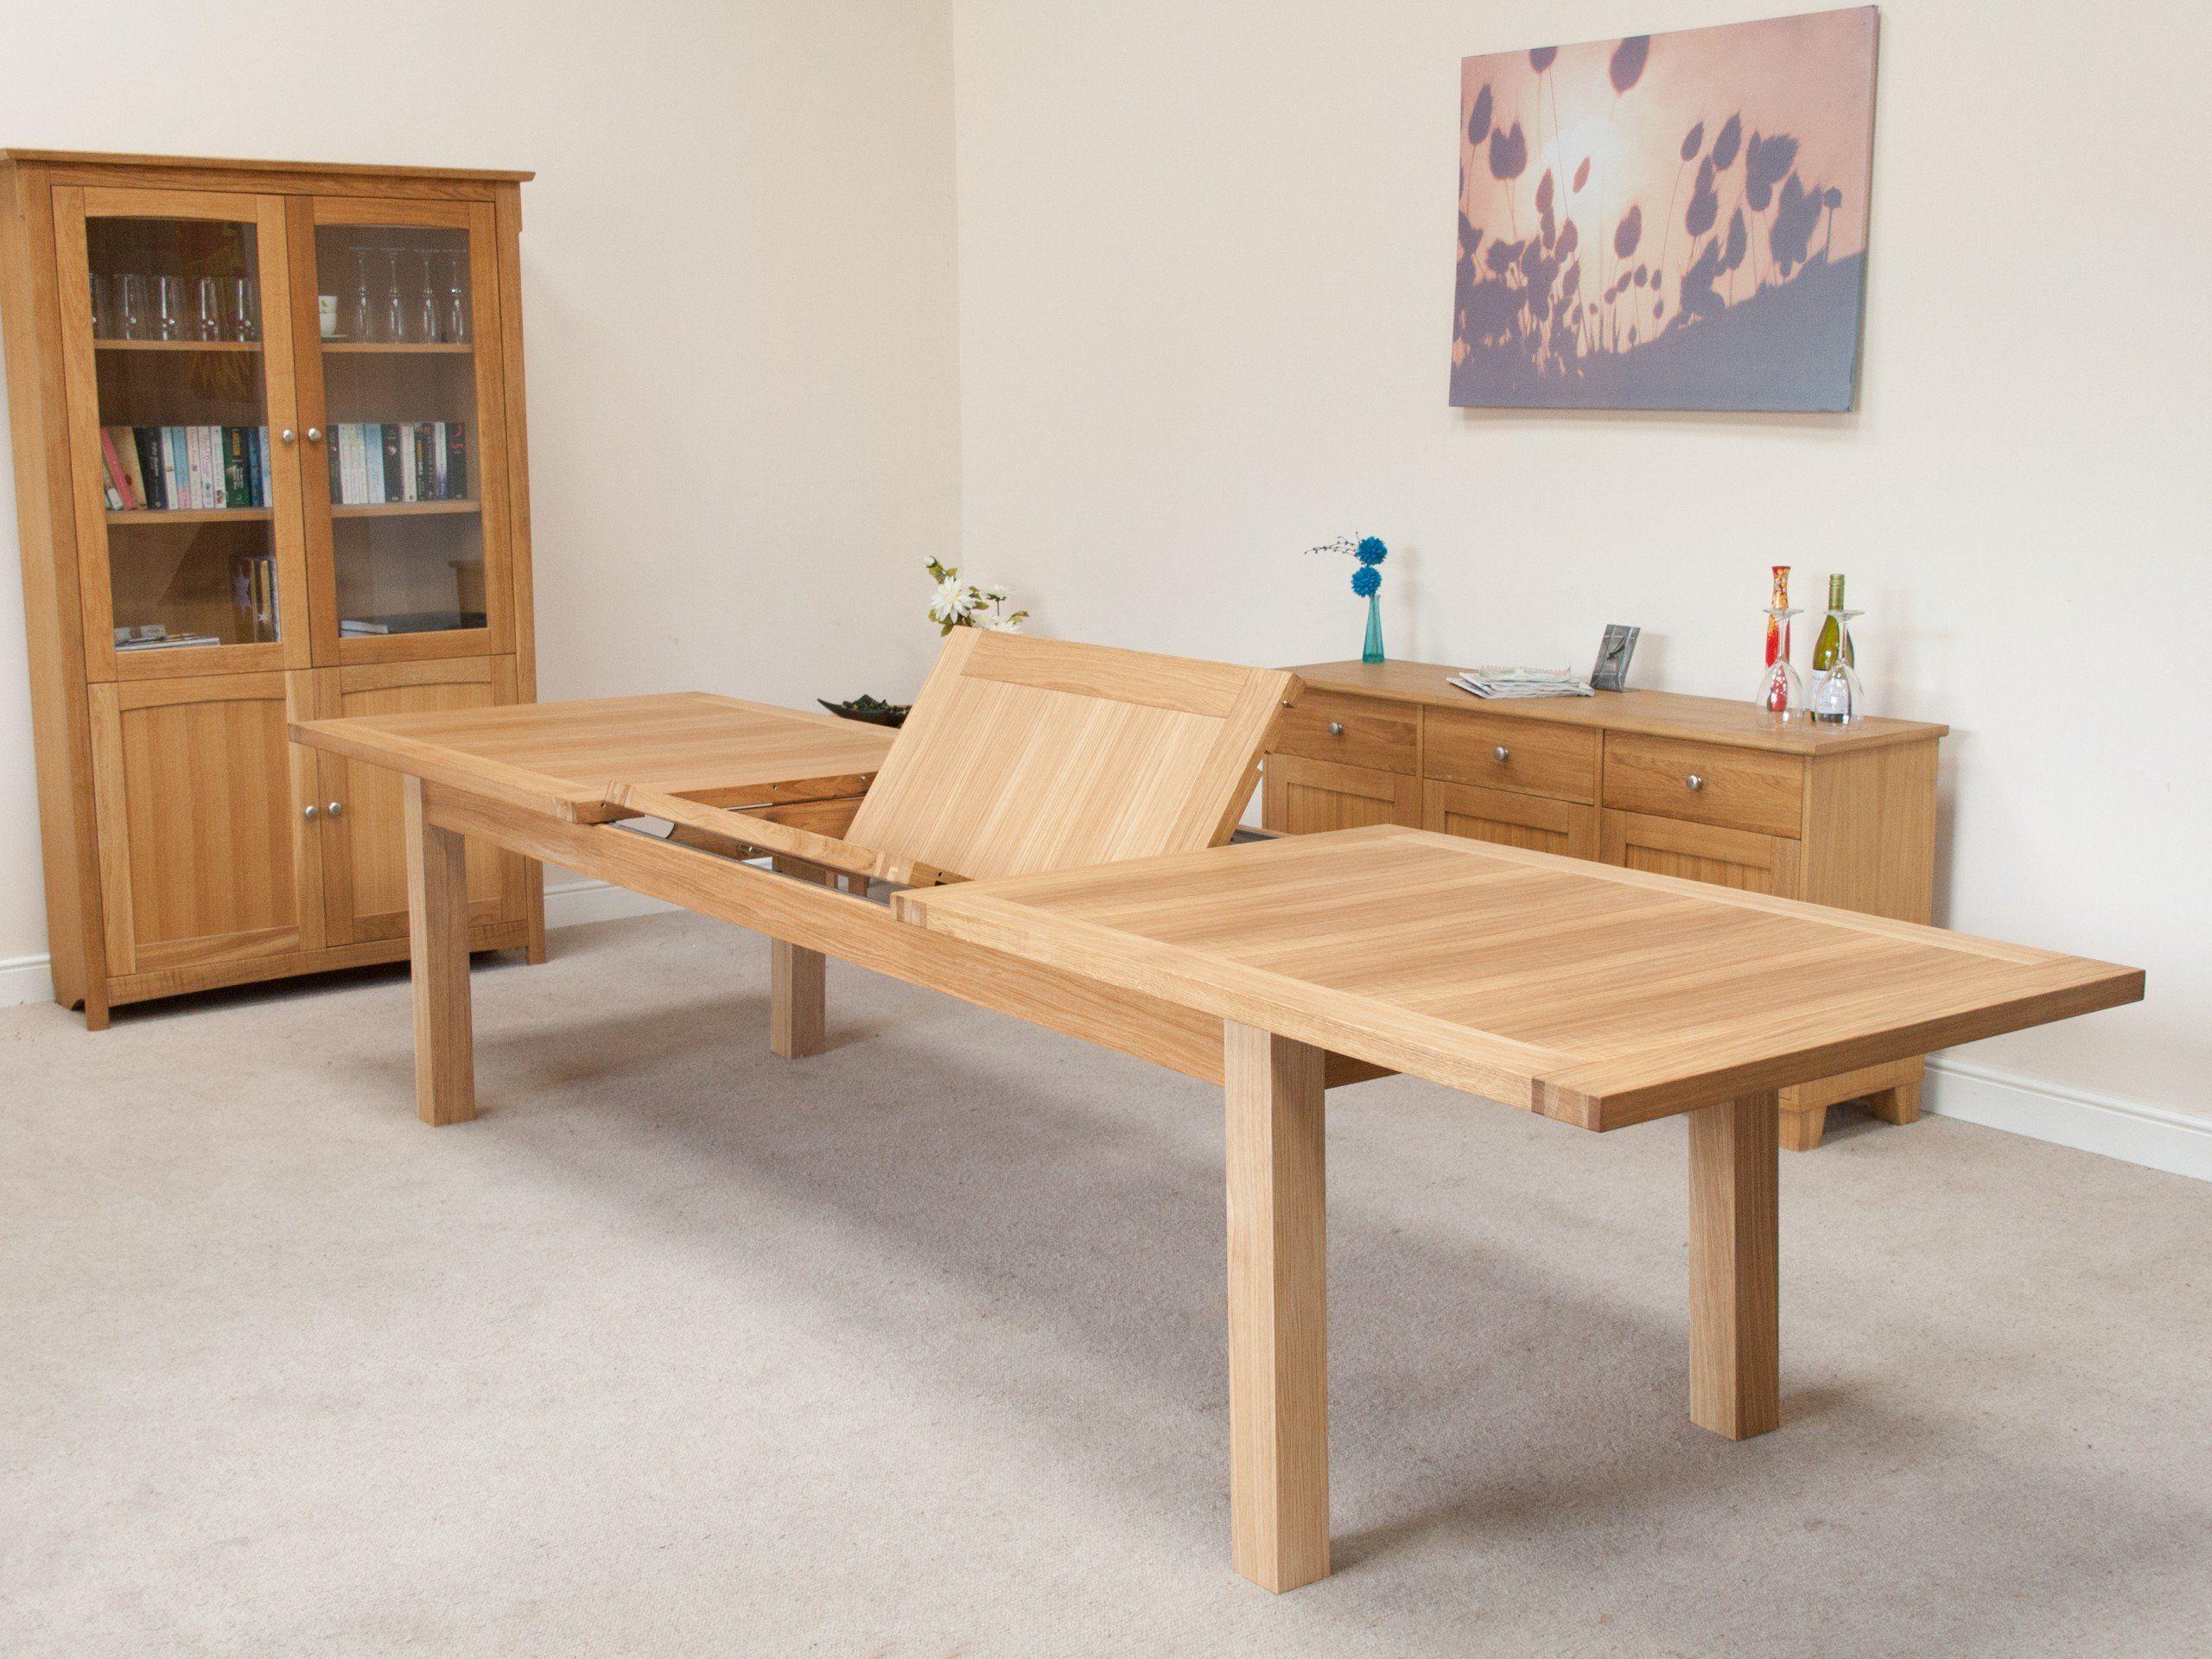 Tallinn 3 8m Large Eu Made Oak Extending Table Spring Dining